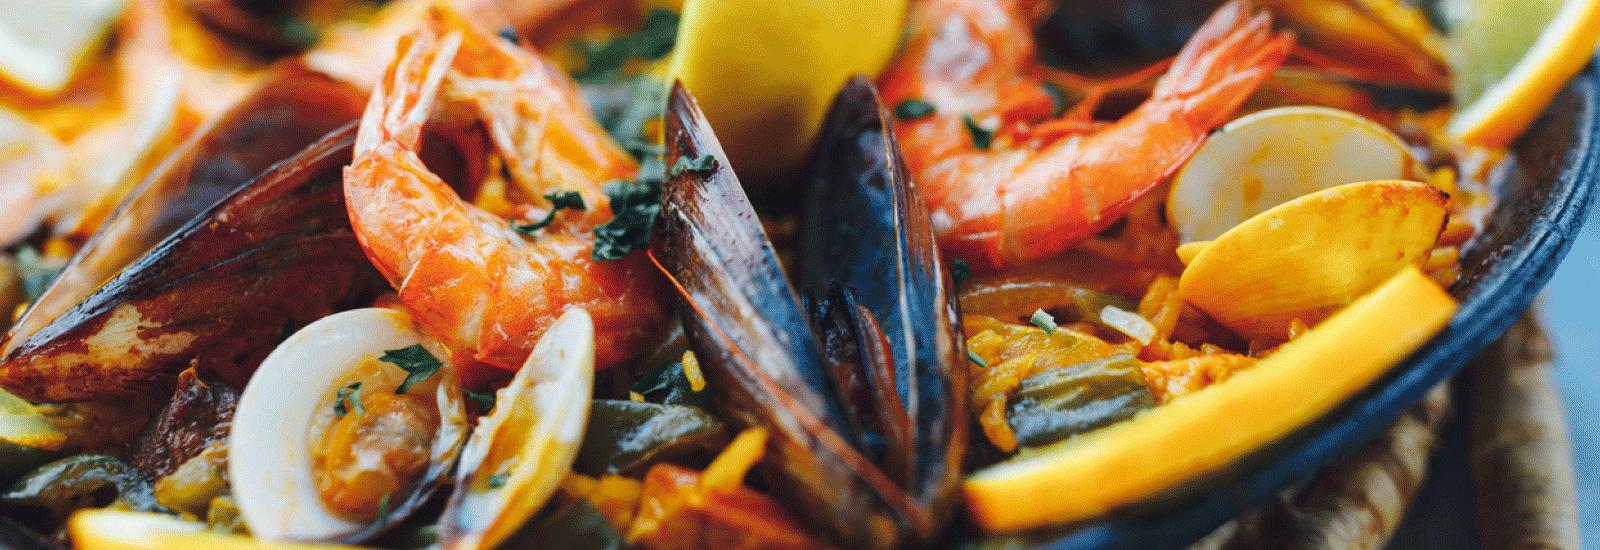 Best Restaurants in Biloxi